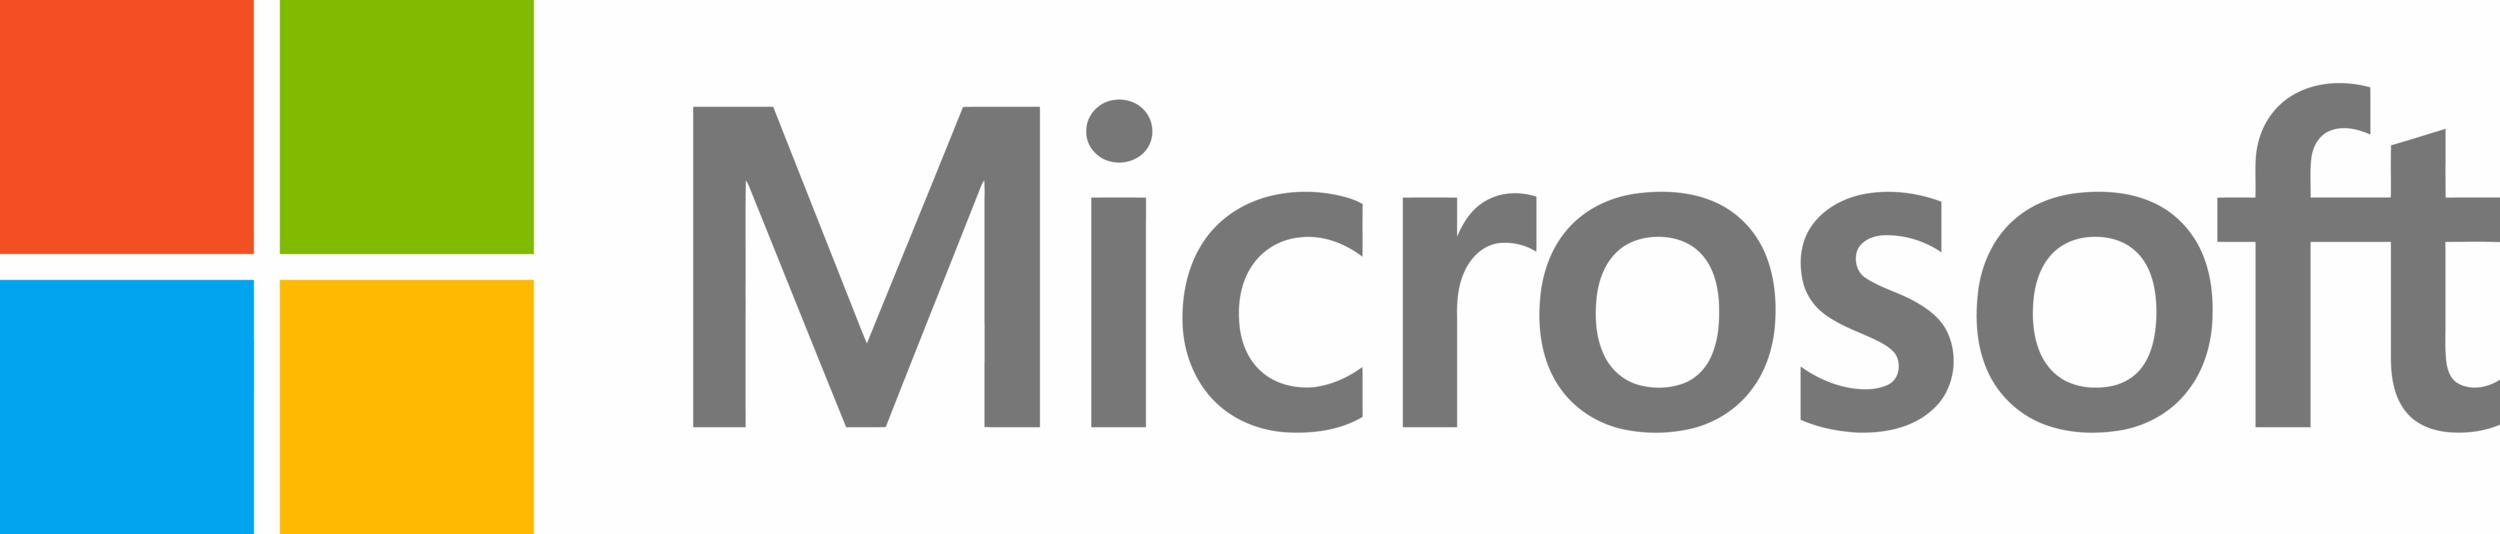 msft_logo_print.png